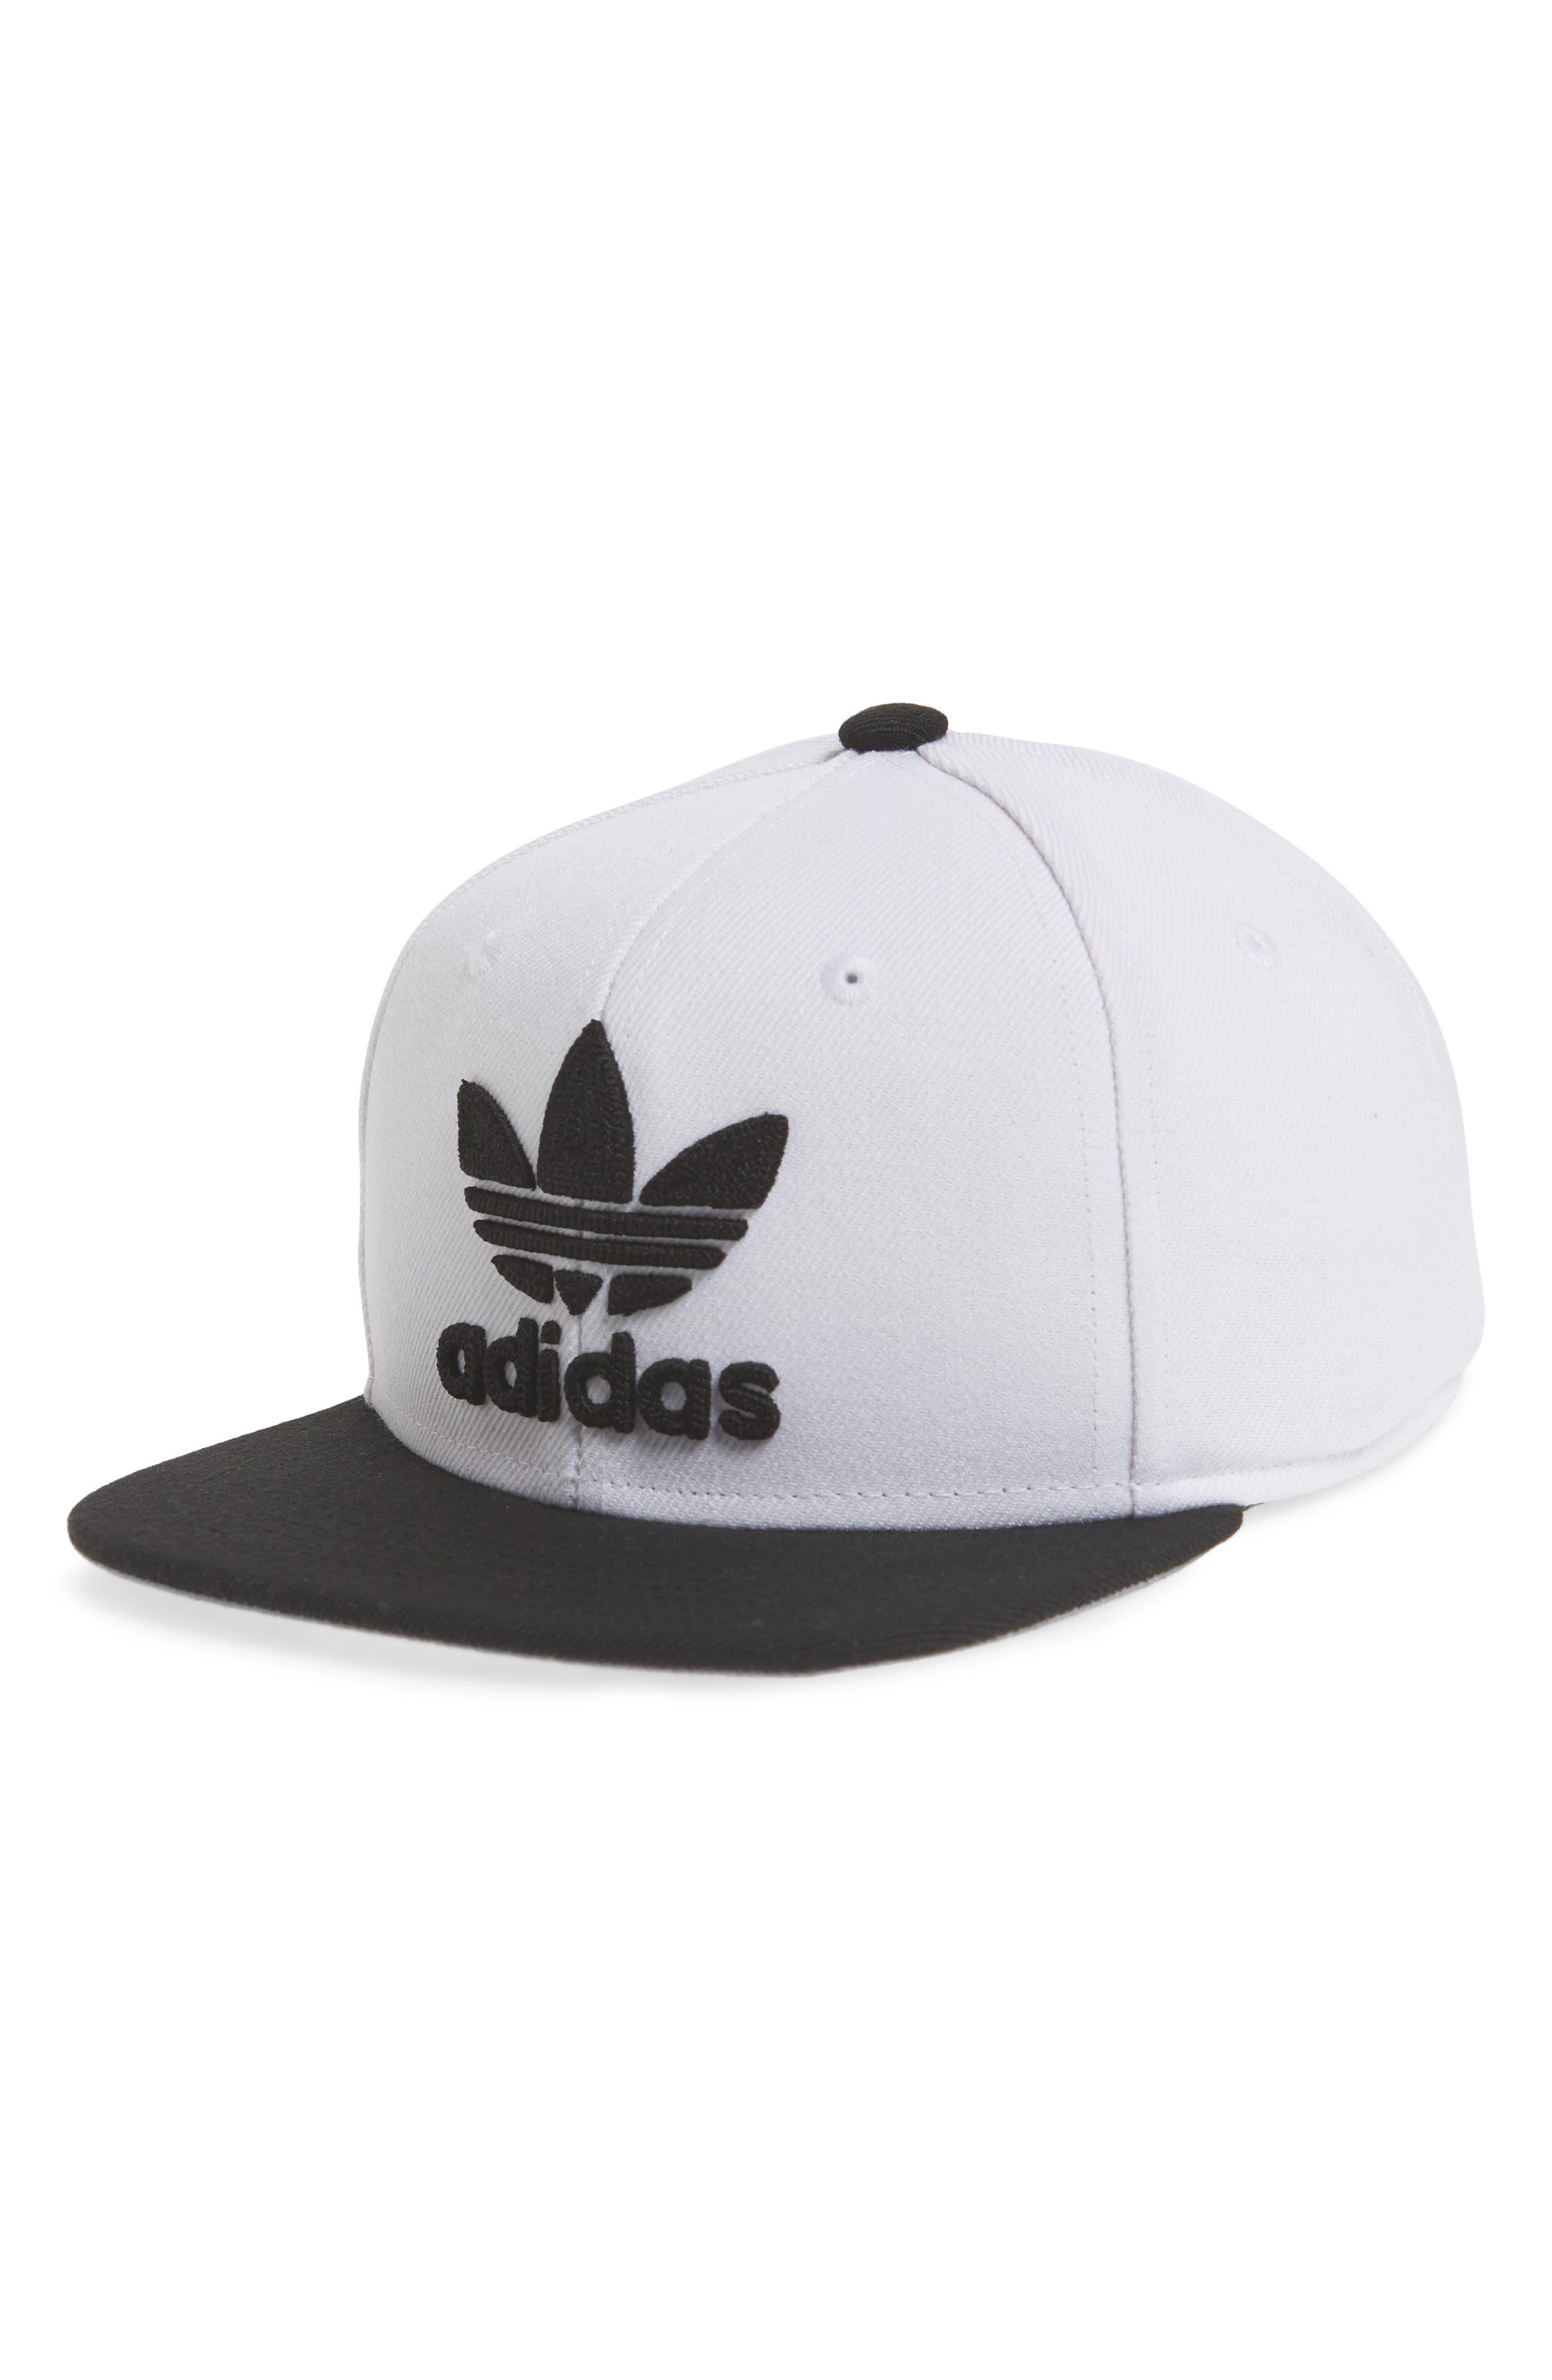 ADIDAS Originals Snapback Hat, Main, color, 100